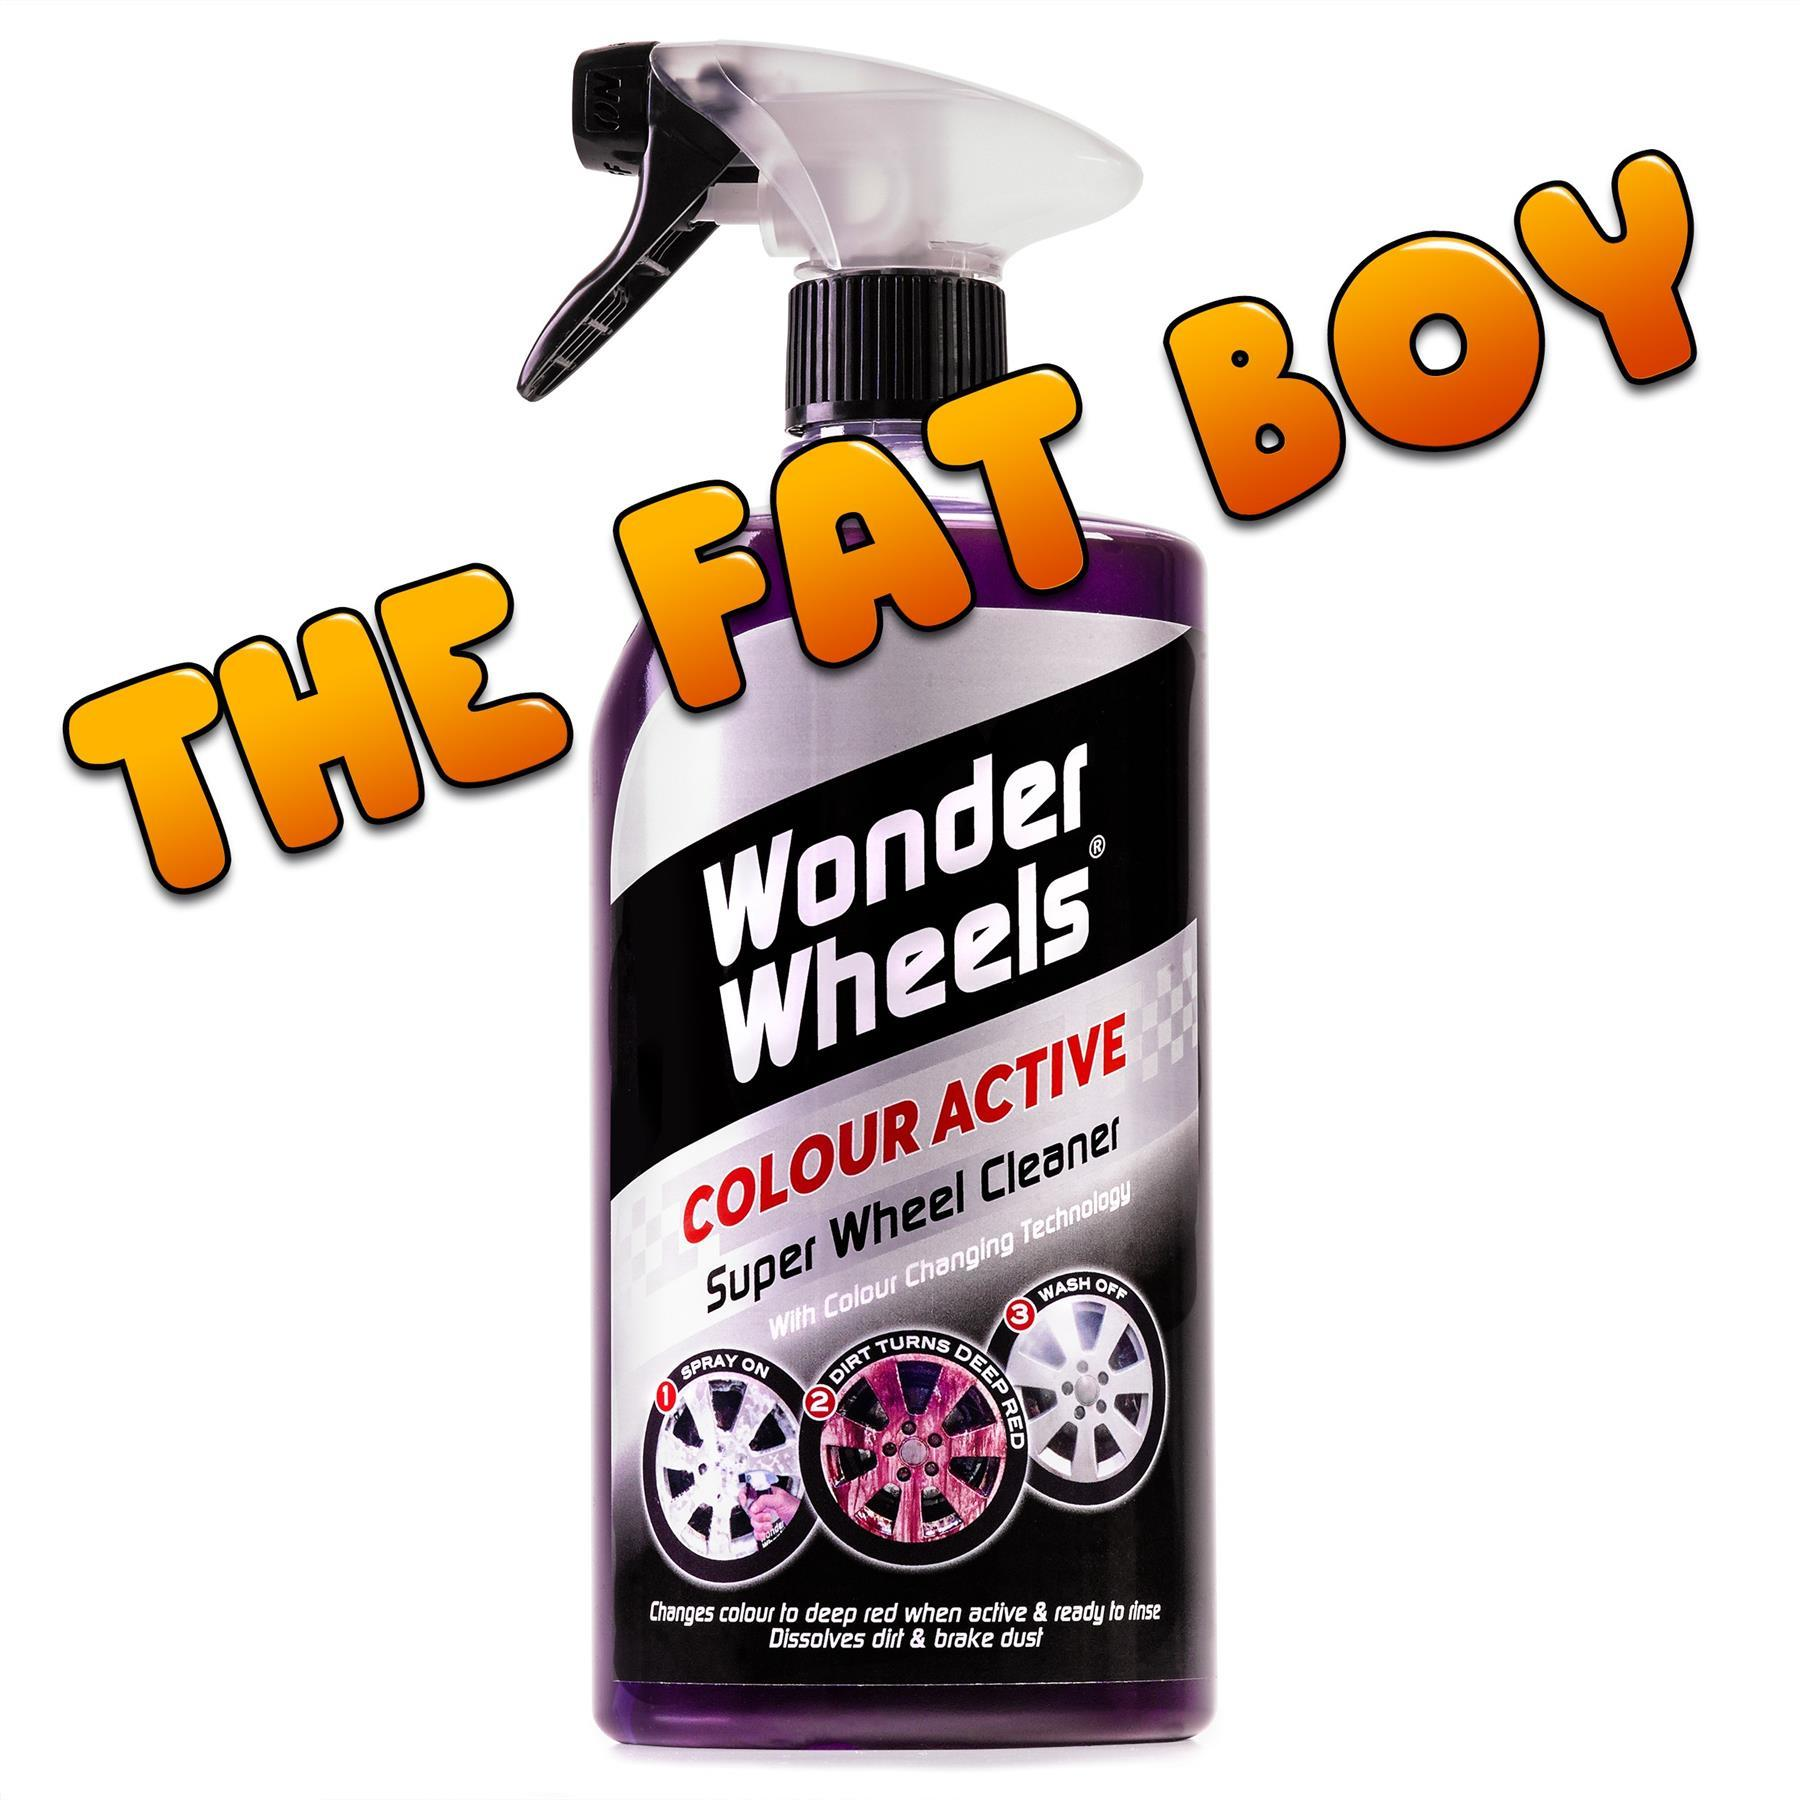 thumbnail 3 - Wonder-Wheels-Colour-Active-Super-Car-Wheel-Cleaner